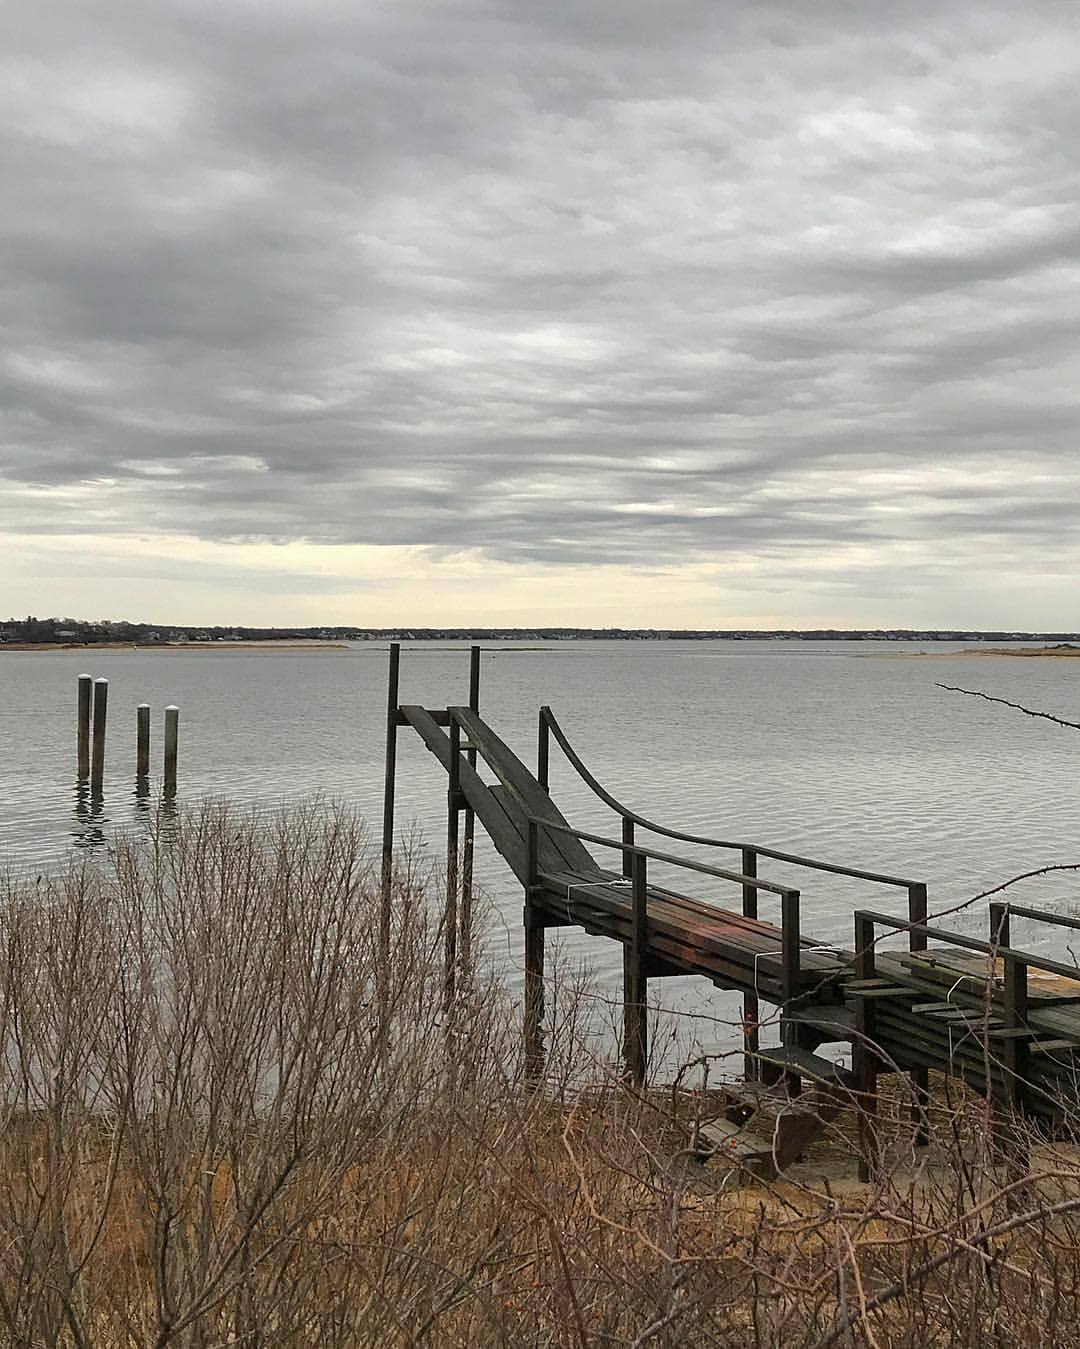 The cold hard gray of February.  -  #massachusetts #capecod #awaitingtheangels  (at Osterville, Massachusetts)